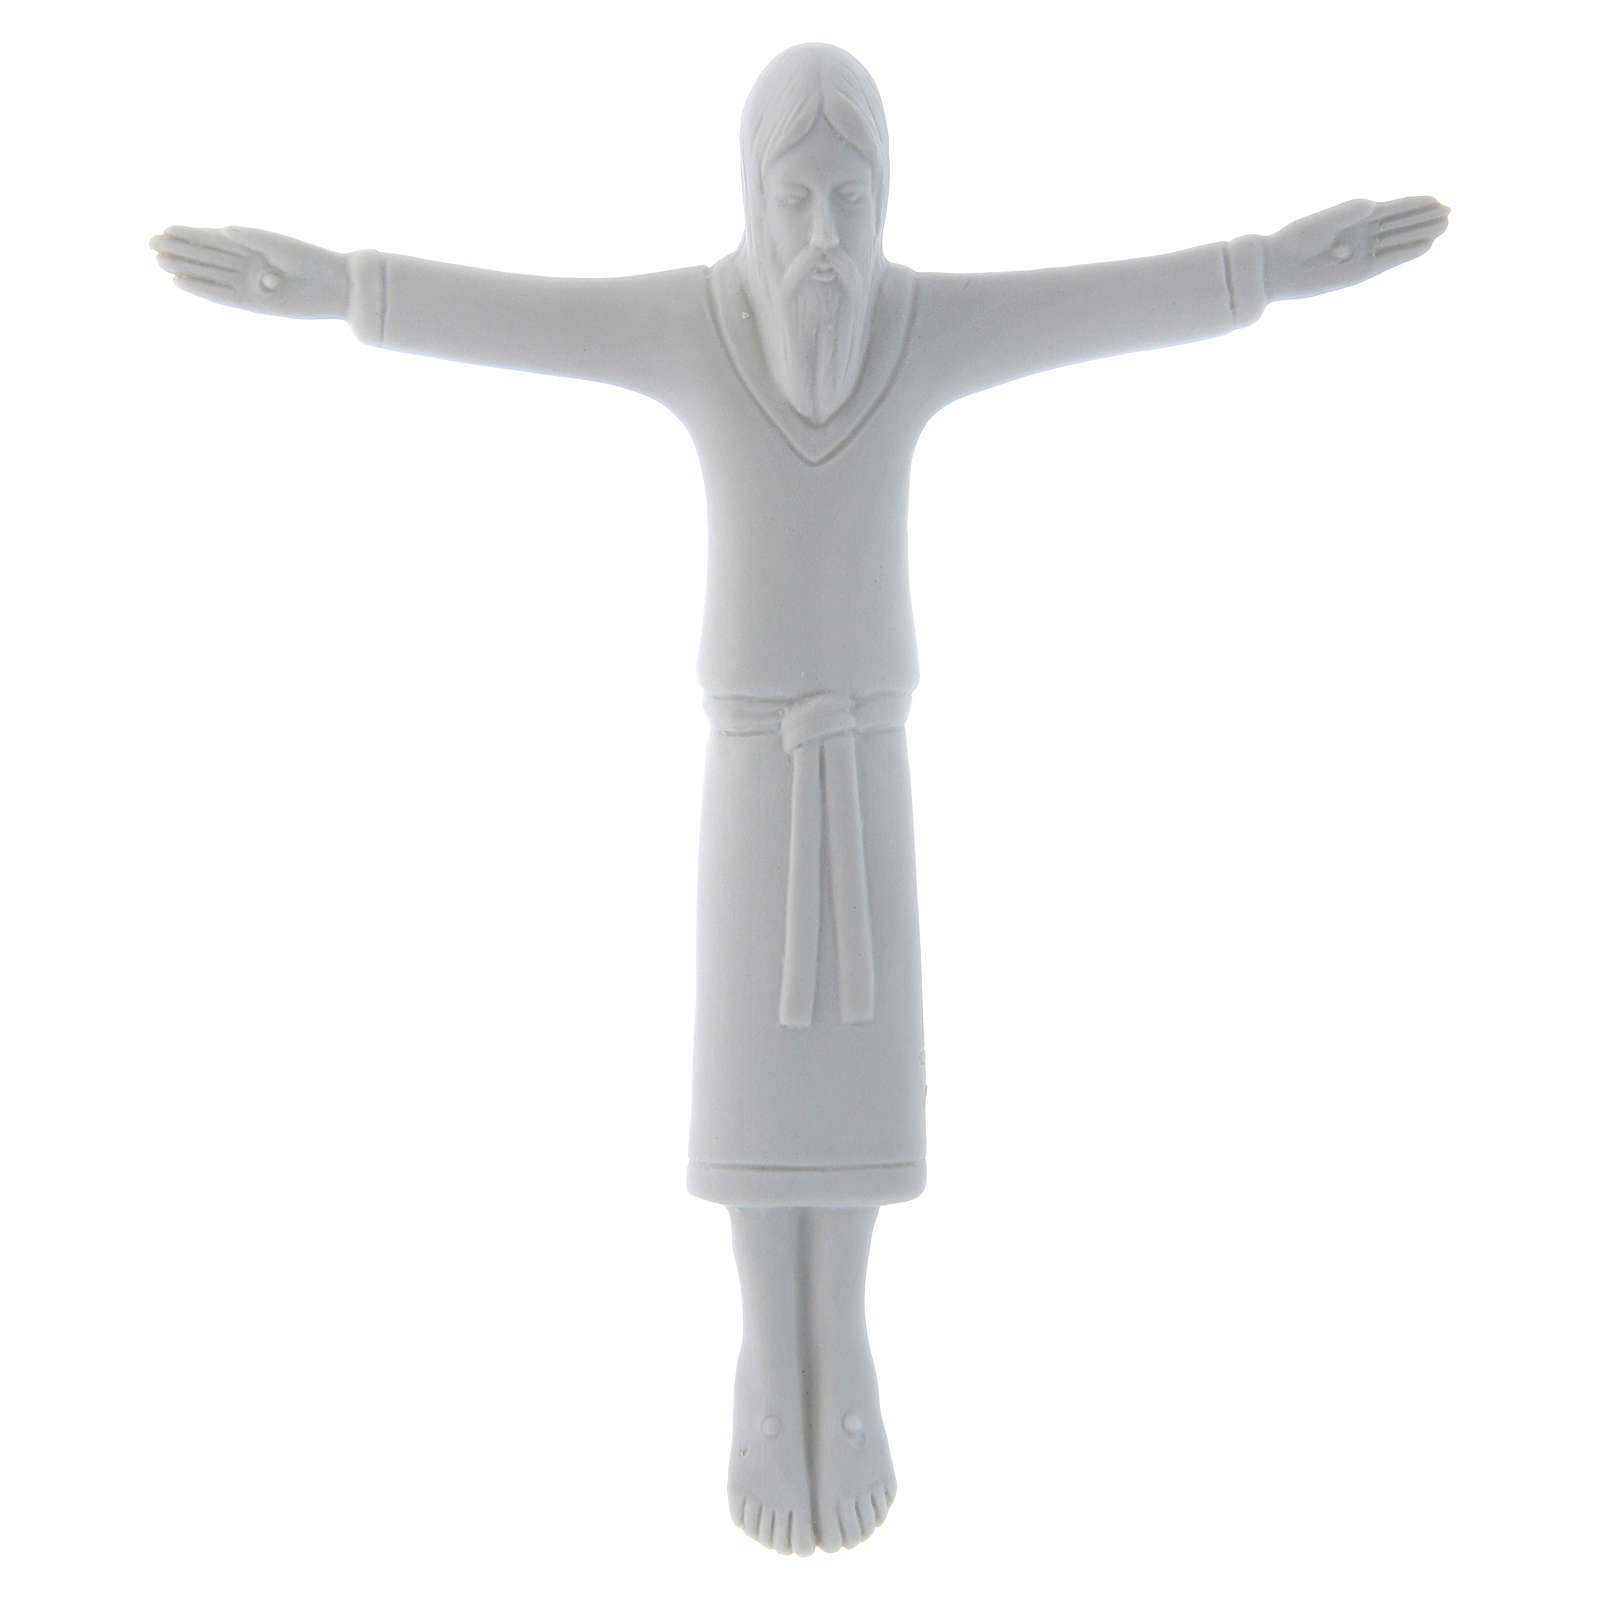 Bajorrelieve porcelana blanca Cristo con Santa Túnica 17x15 cm Pinton 4